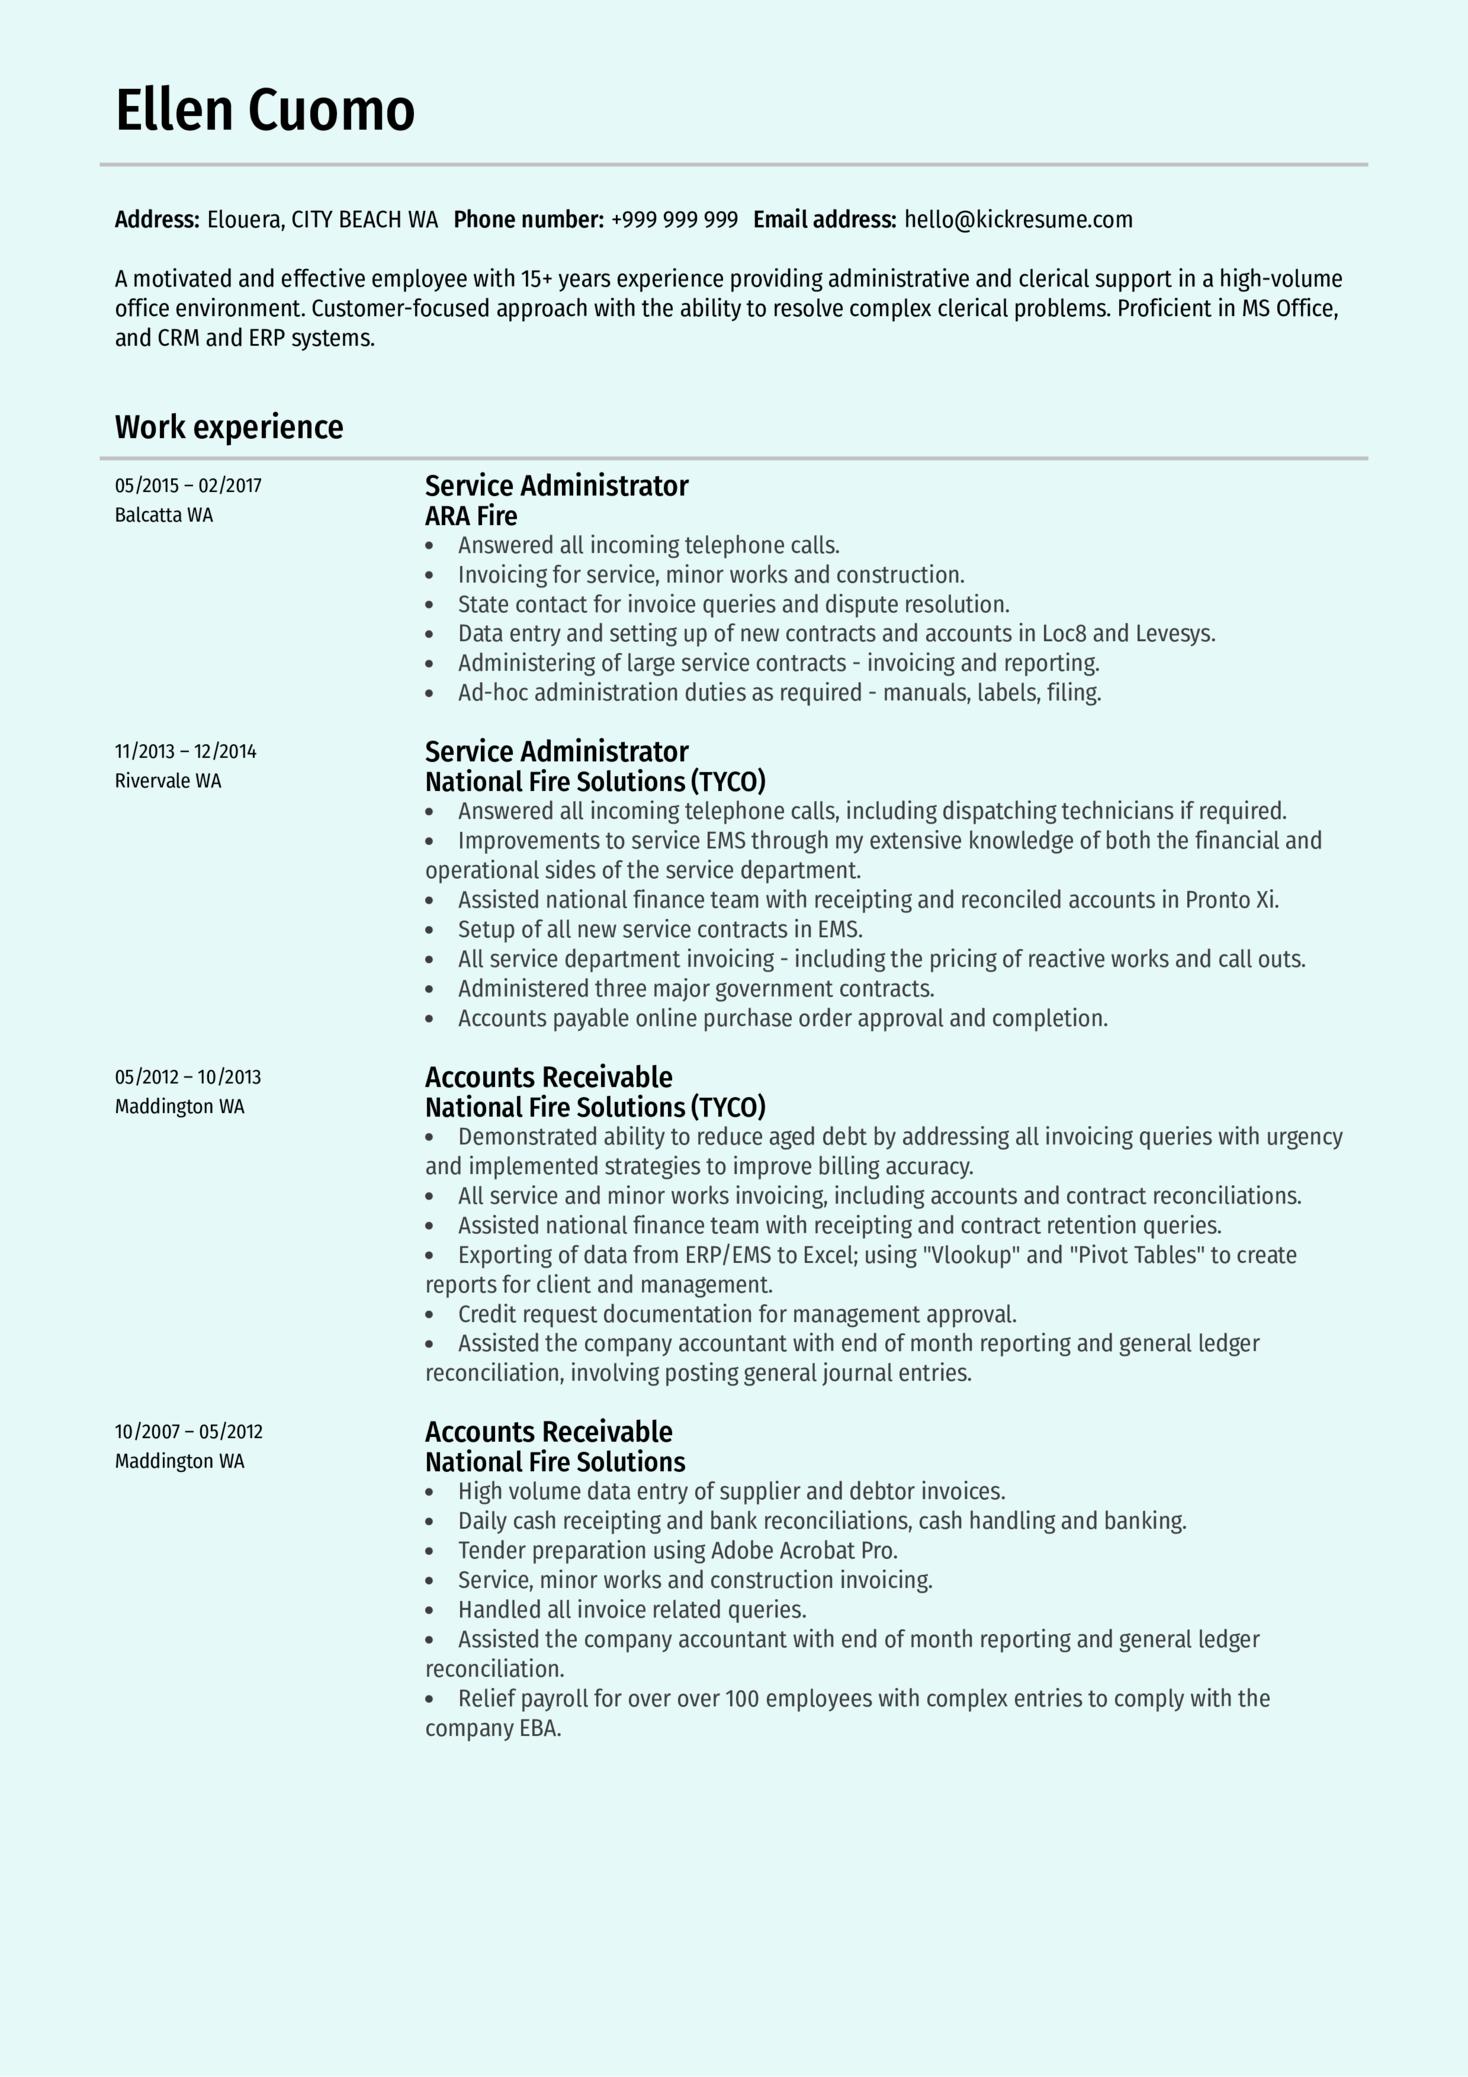 Service Administrator Resume Sample (parte 1)